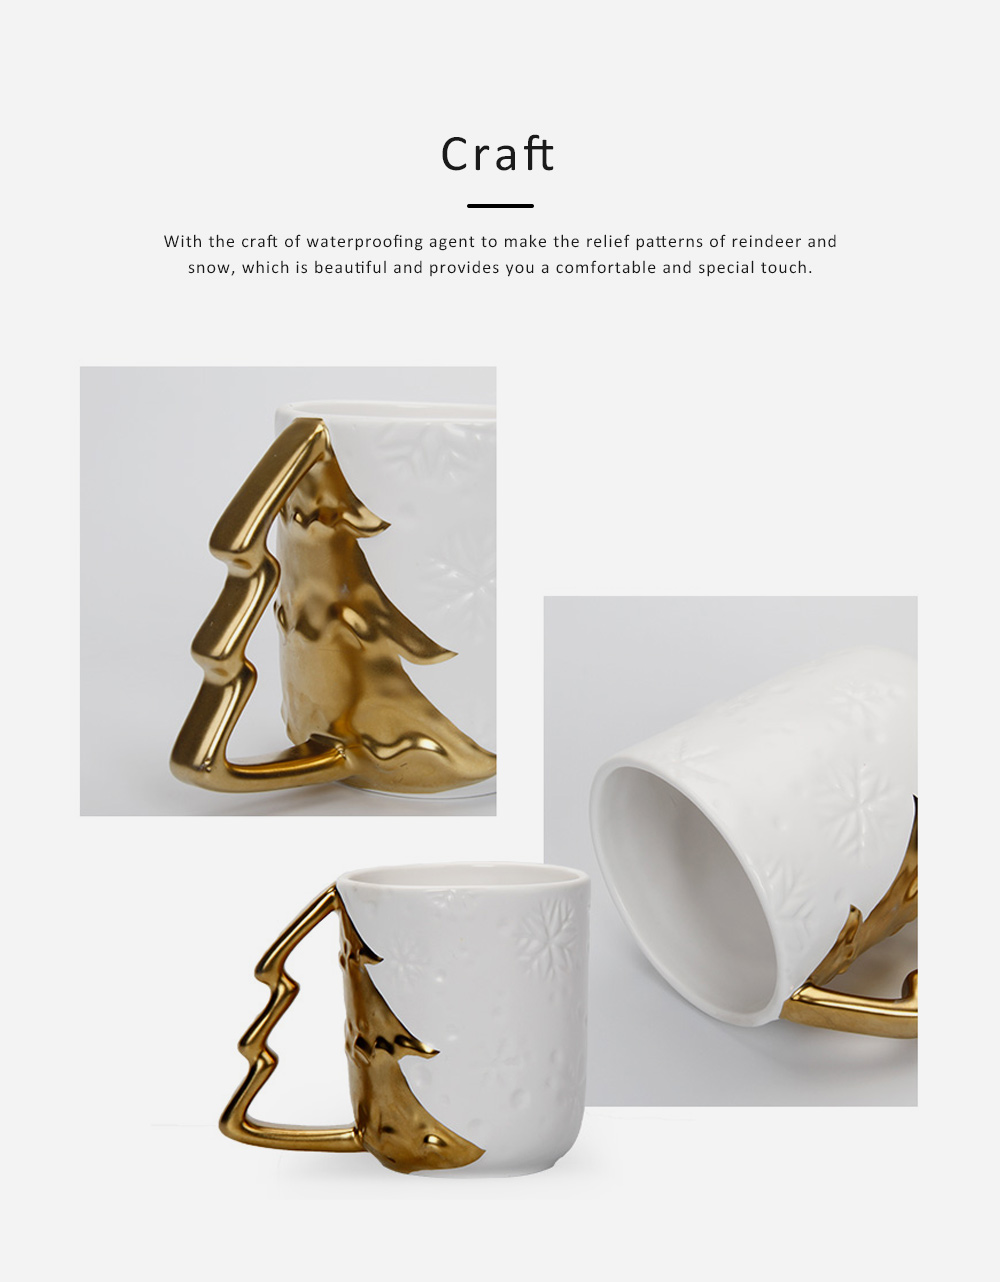 Ceramic Mug Cup with Glaze for Tea, Milk, Coffee, Water, Decoration Cup for Christmas, Festivals, Cartoon Water Mug 2